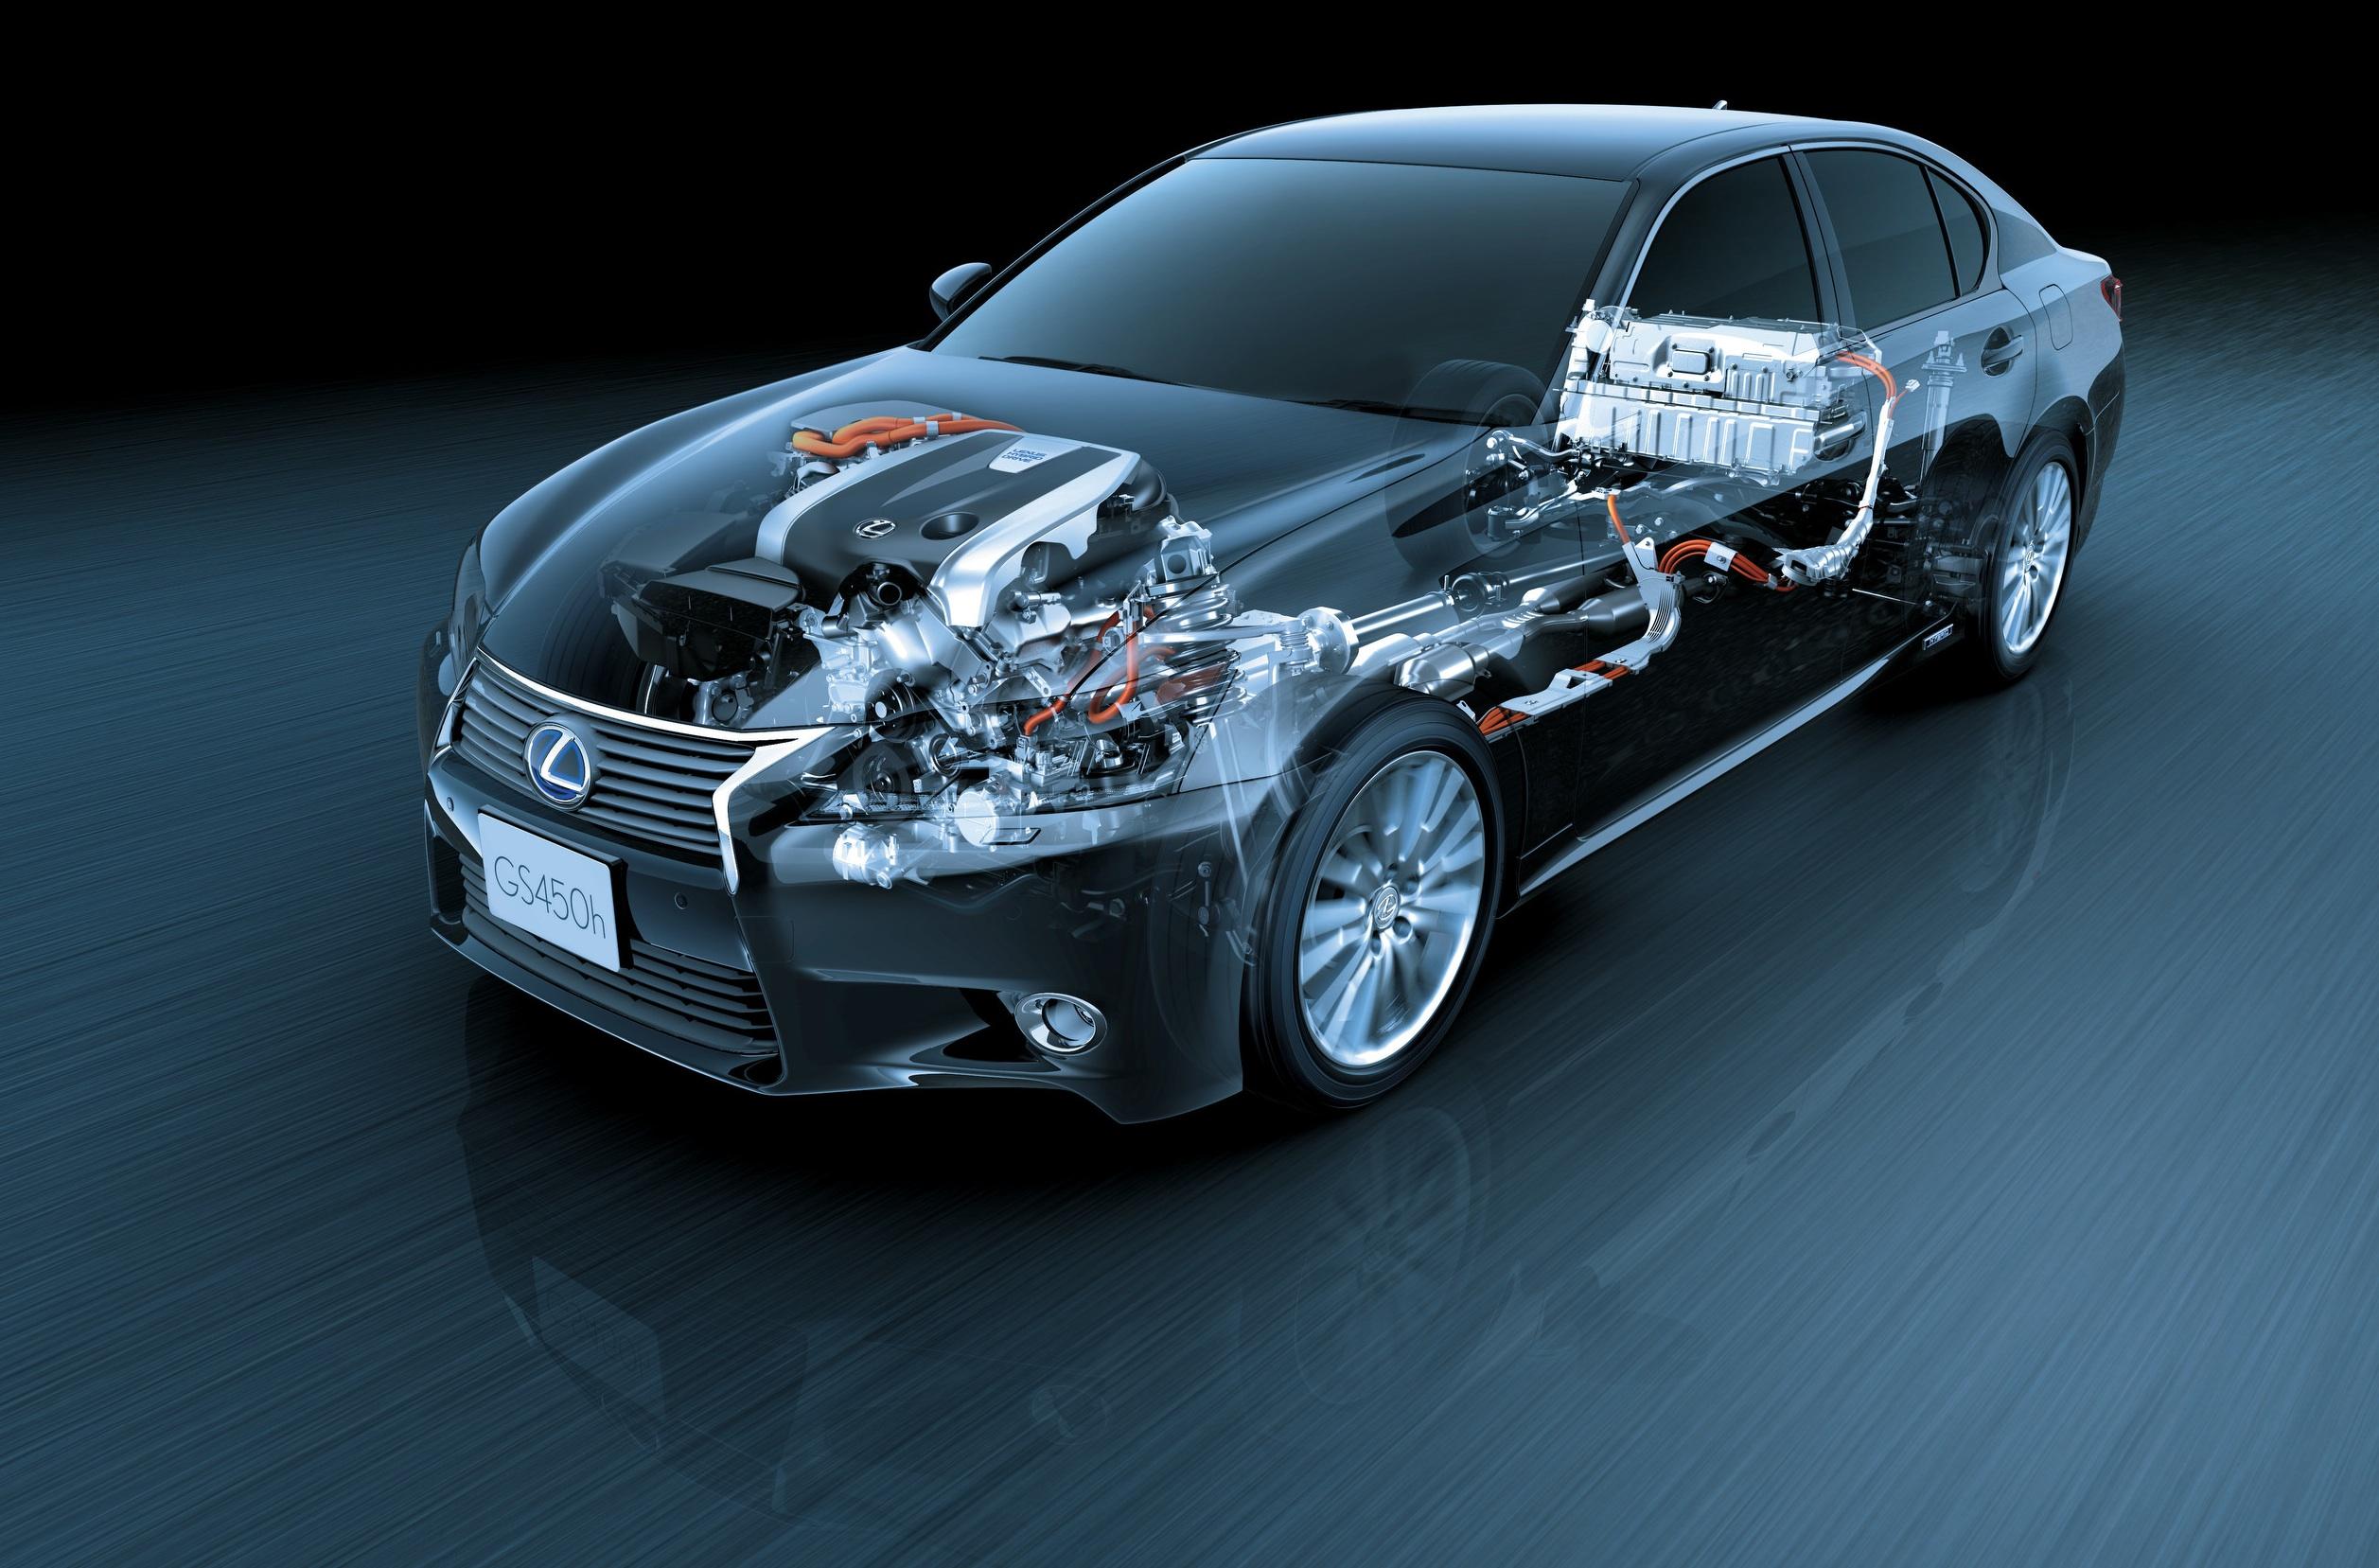 lexus gs450h cars xray engine fight ready toyota hybrids gs german caradvice hybrid rays loading ray mystery drivetrain